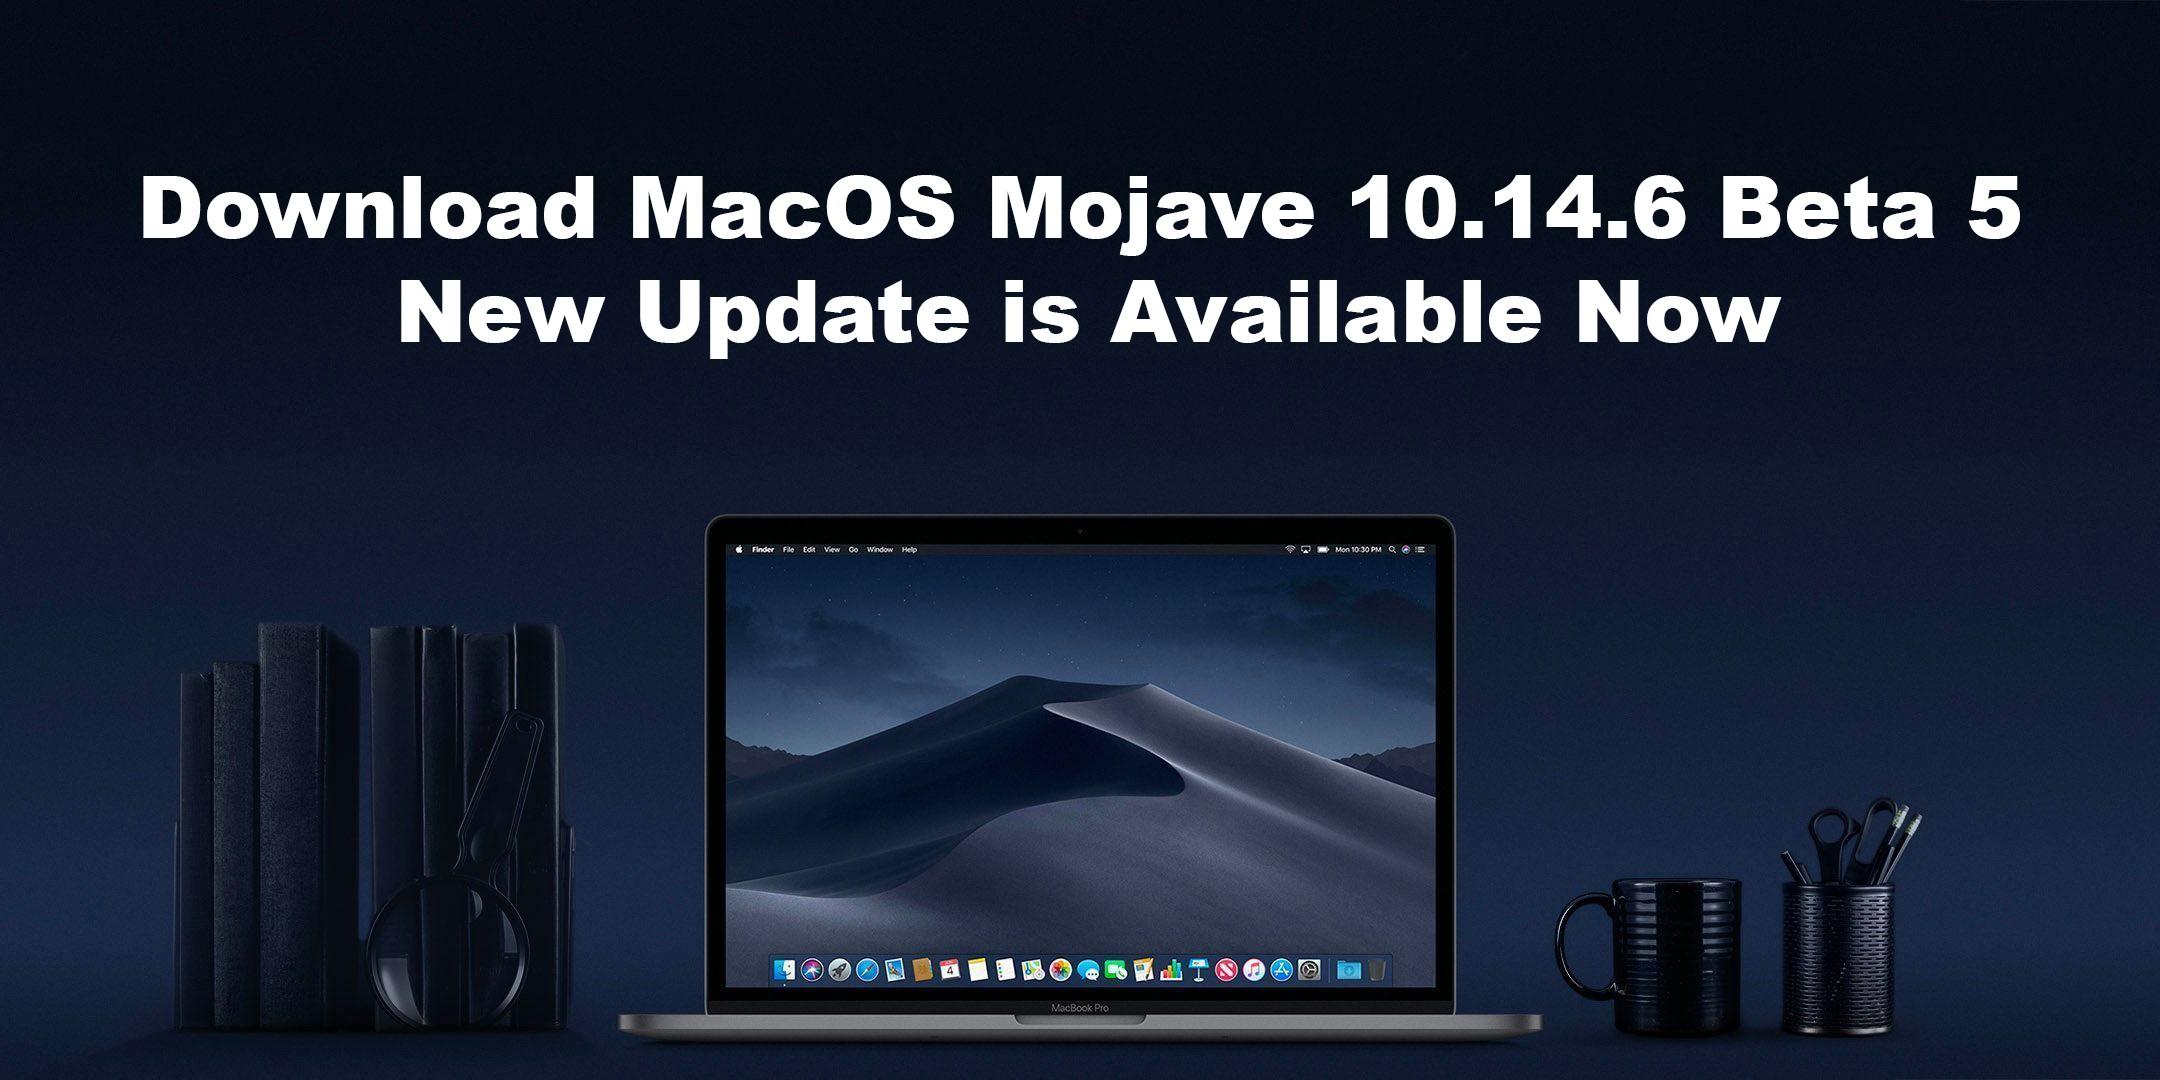 Download Macos 10.14 Mojave Beta